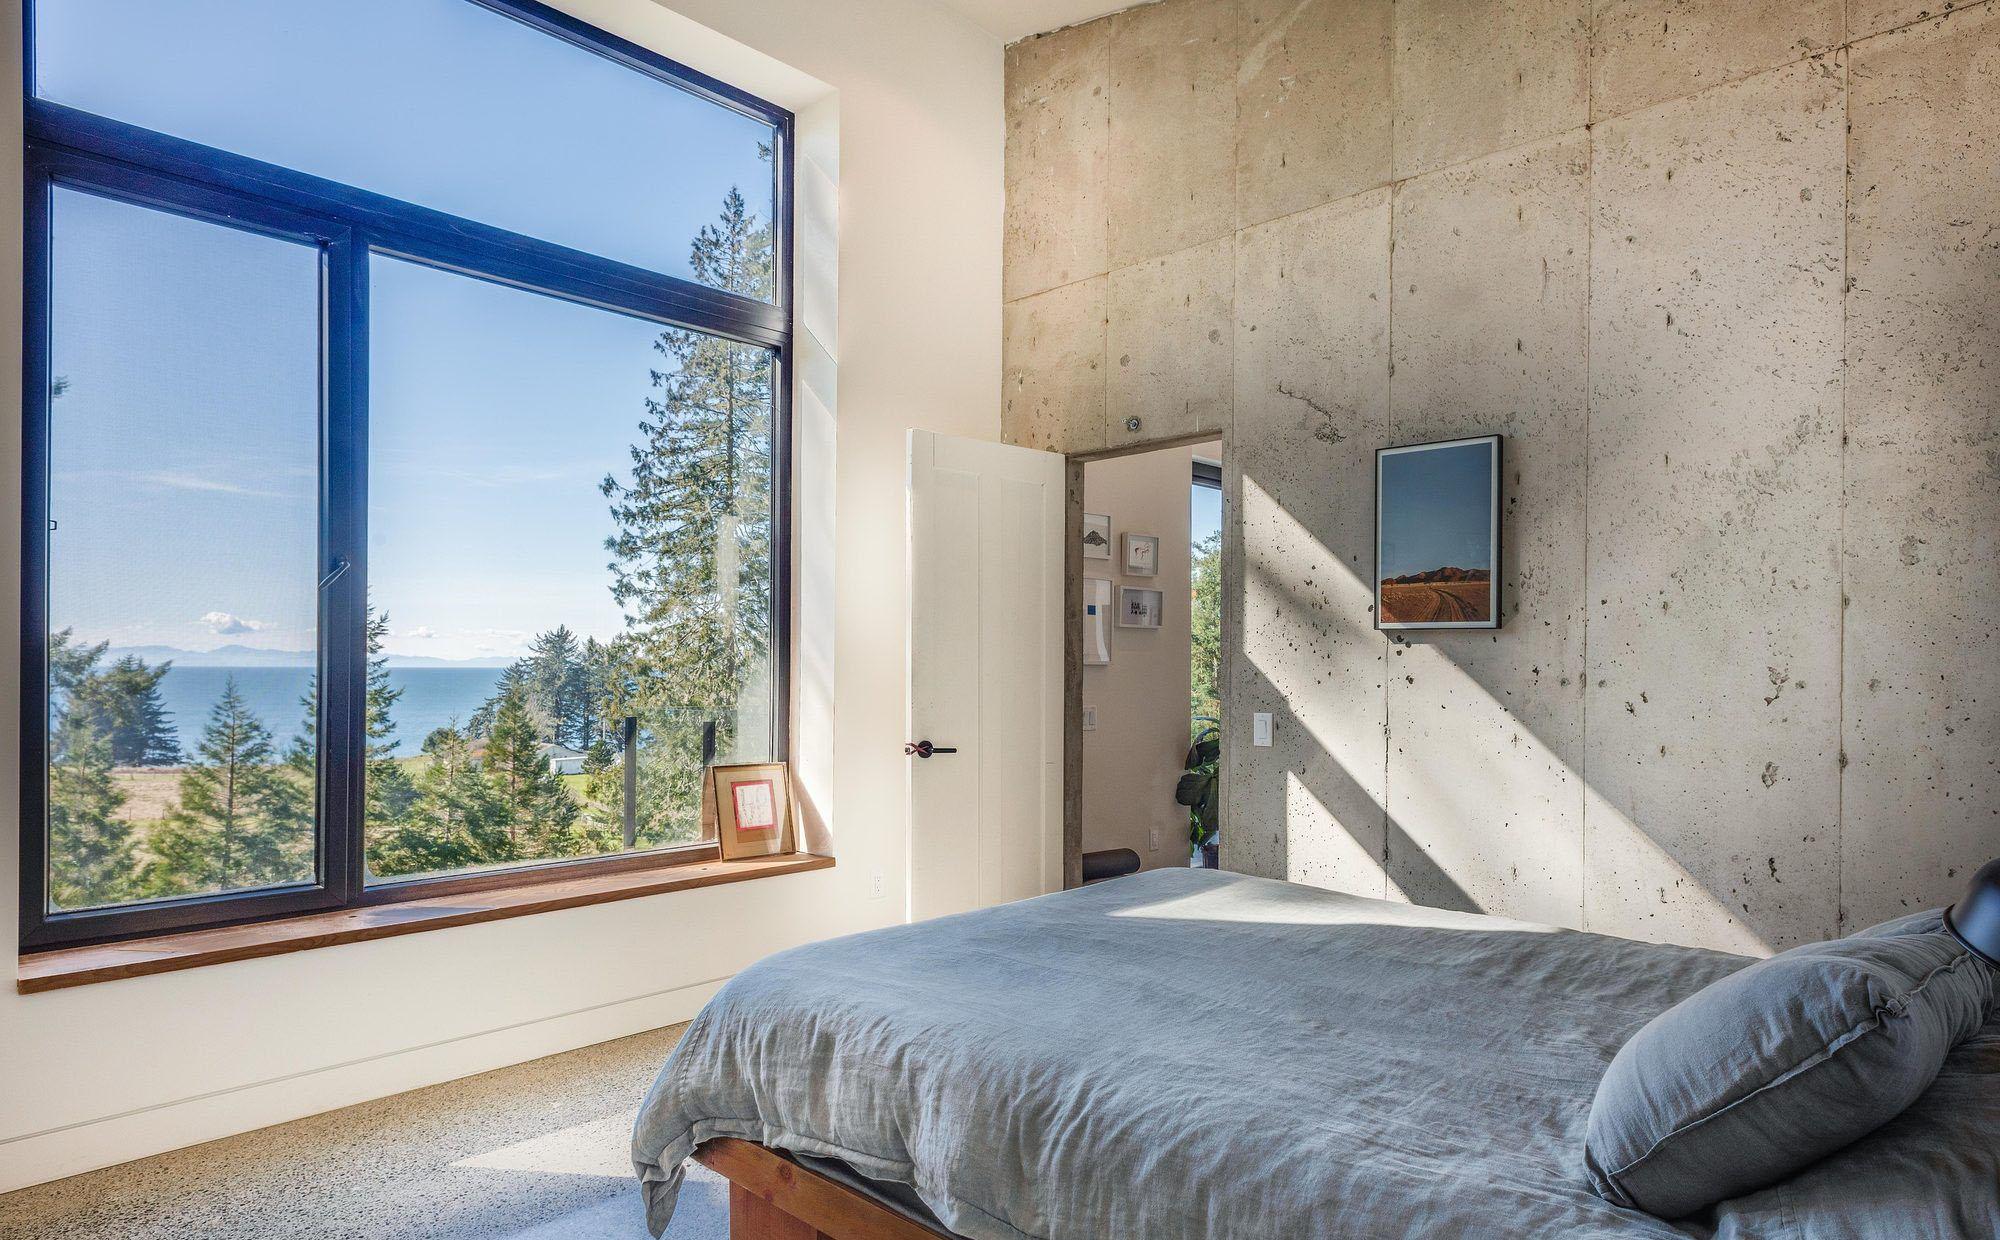 modern bedroom with concrete floors and walls. wood window shelf. minimalism.